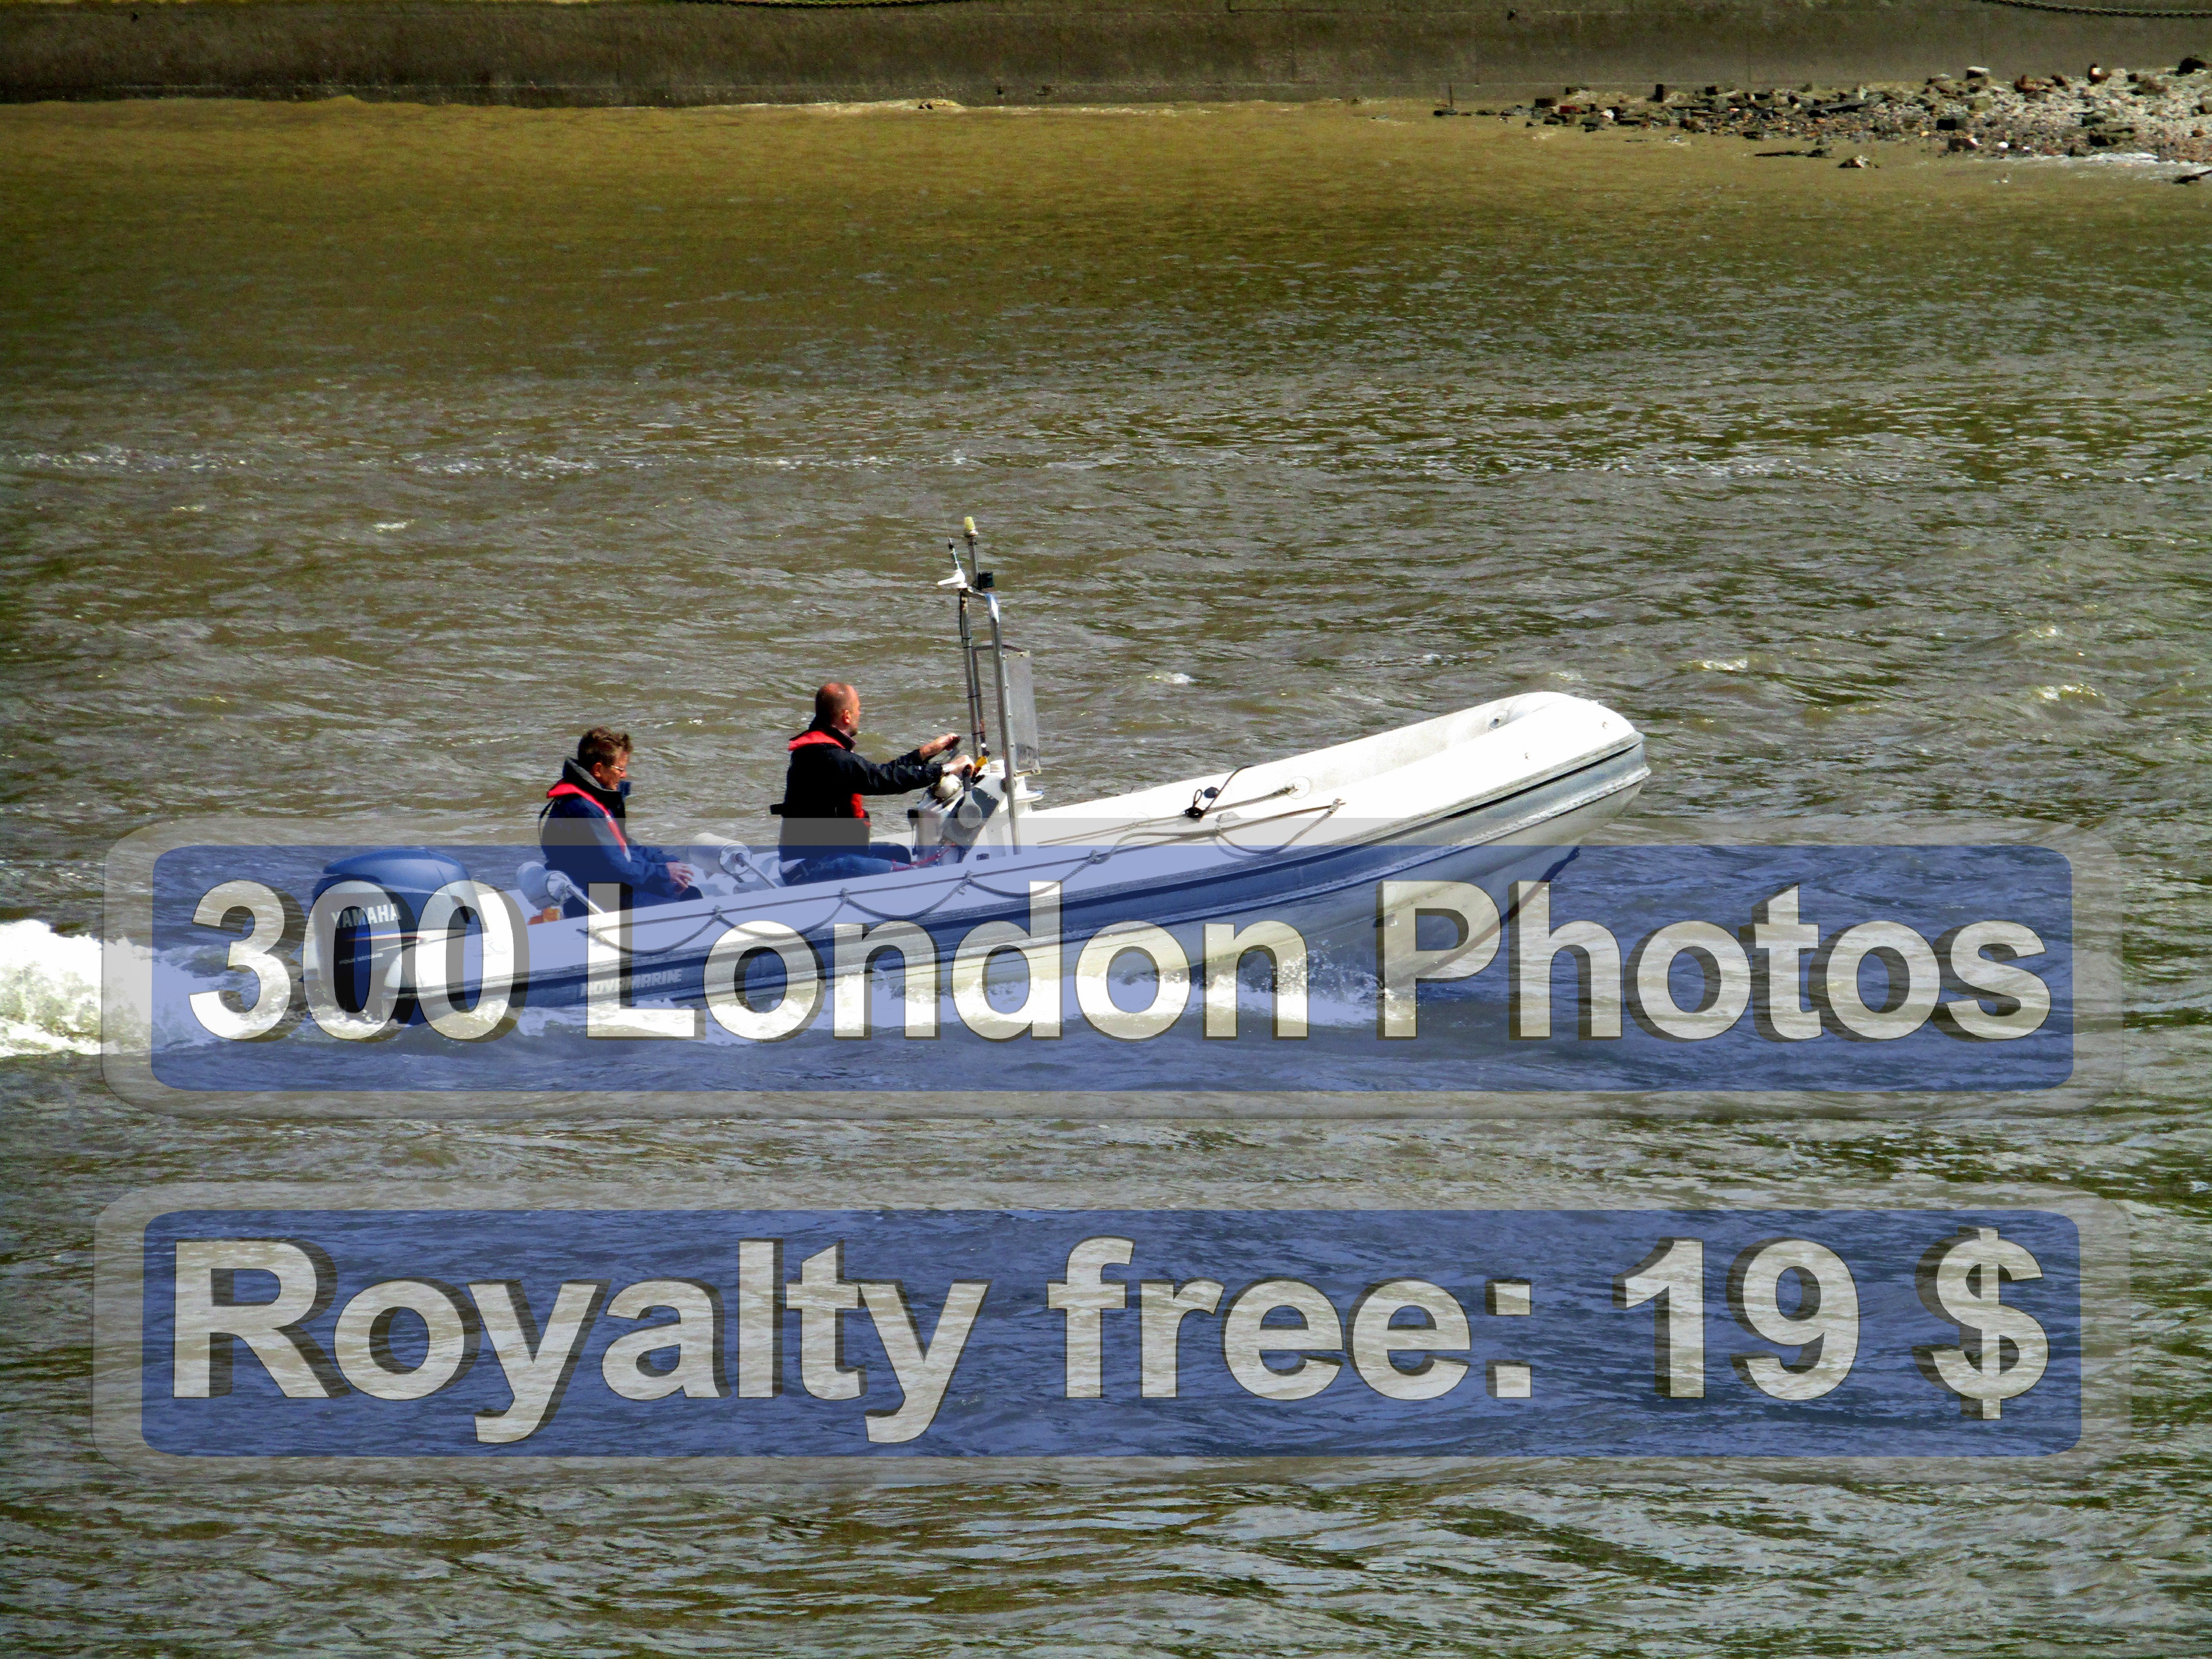 London Photo Equipment Rental